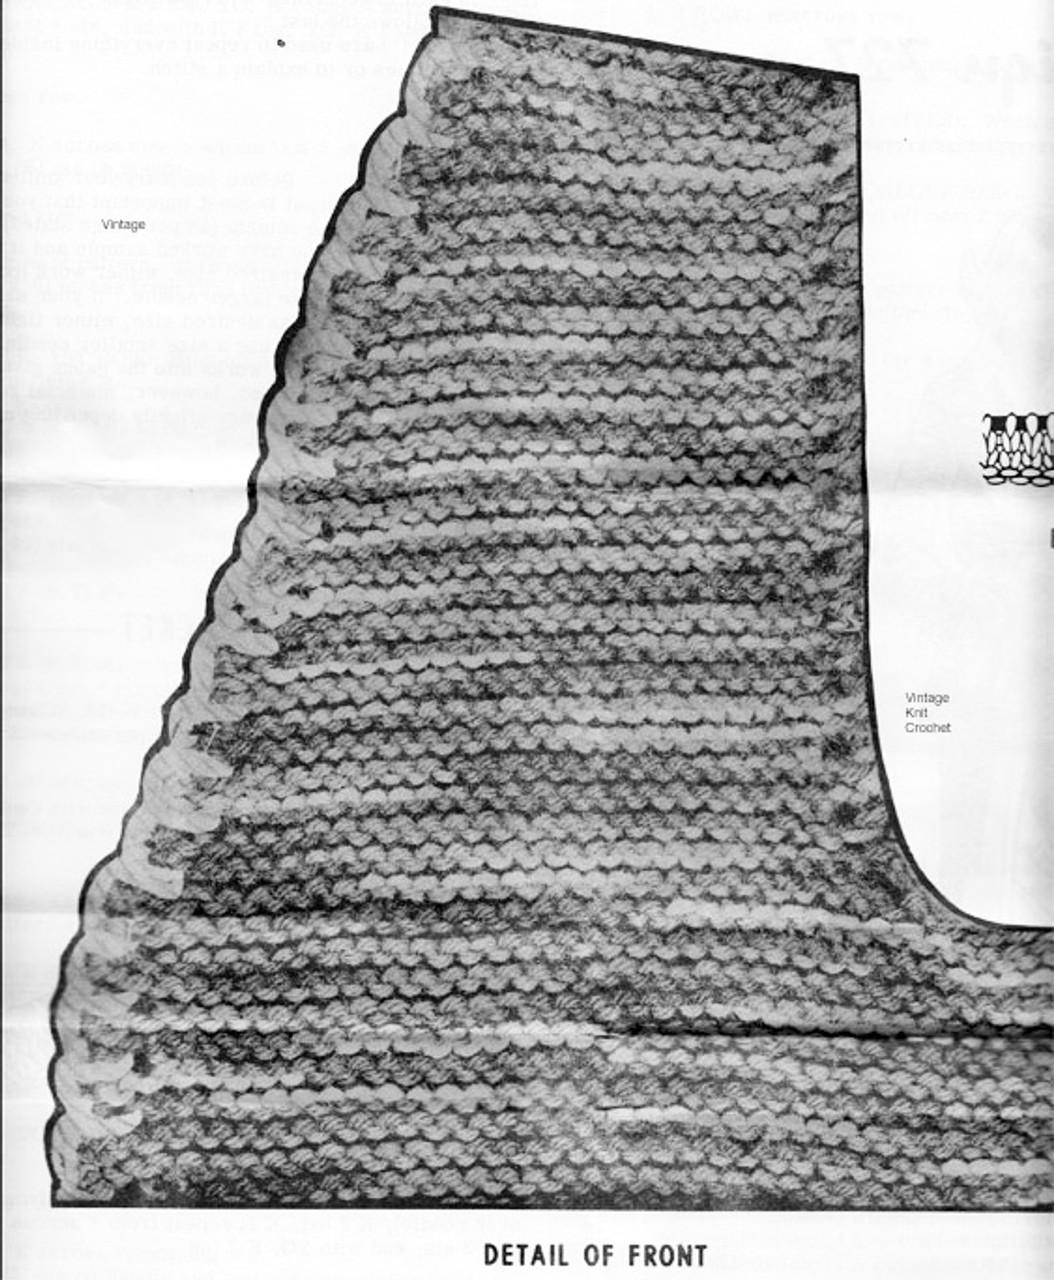 Varigated Jacket Knitting Pattern Detail, Mail Order 727